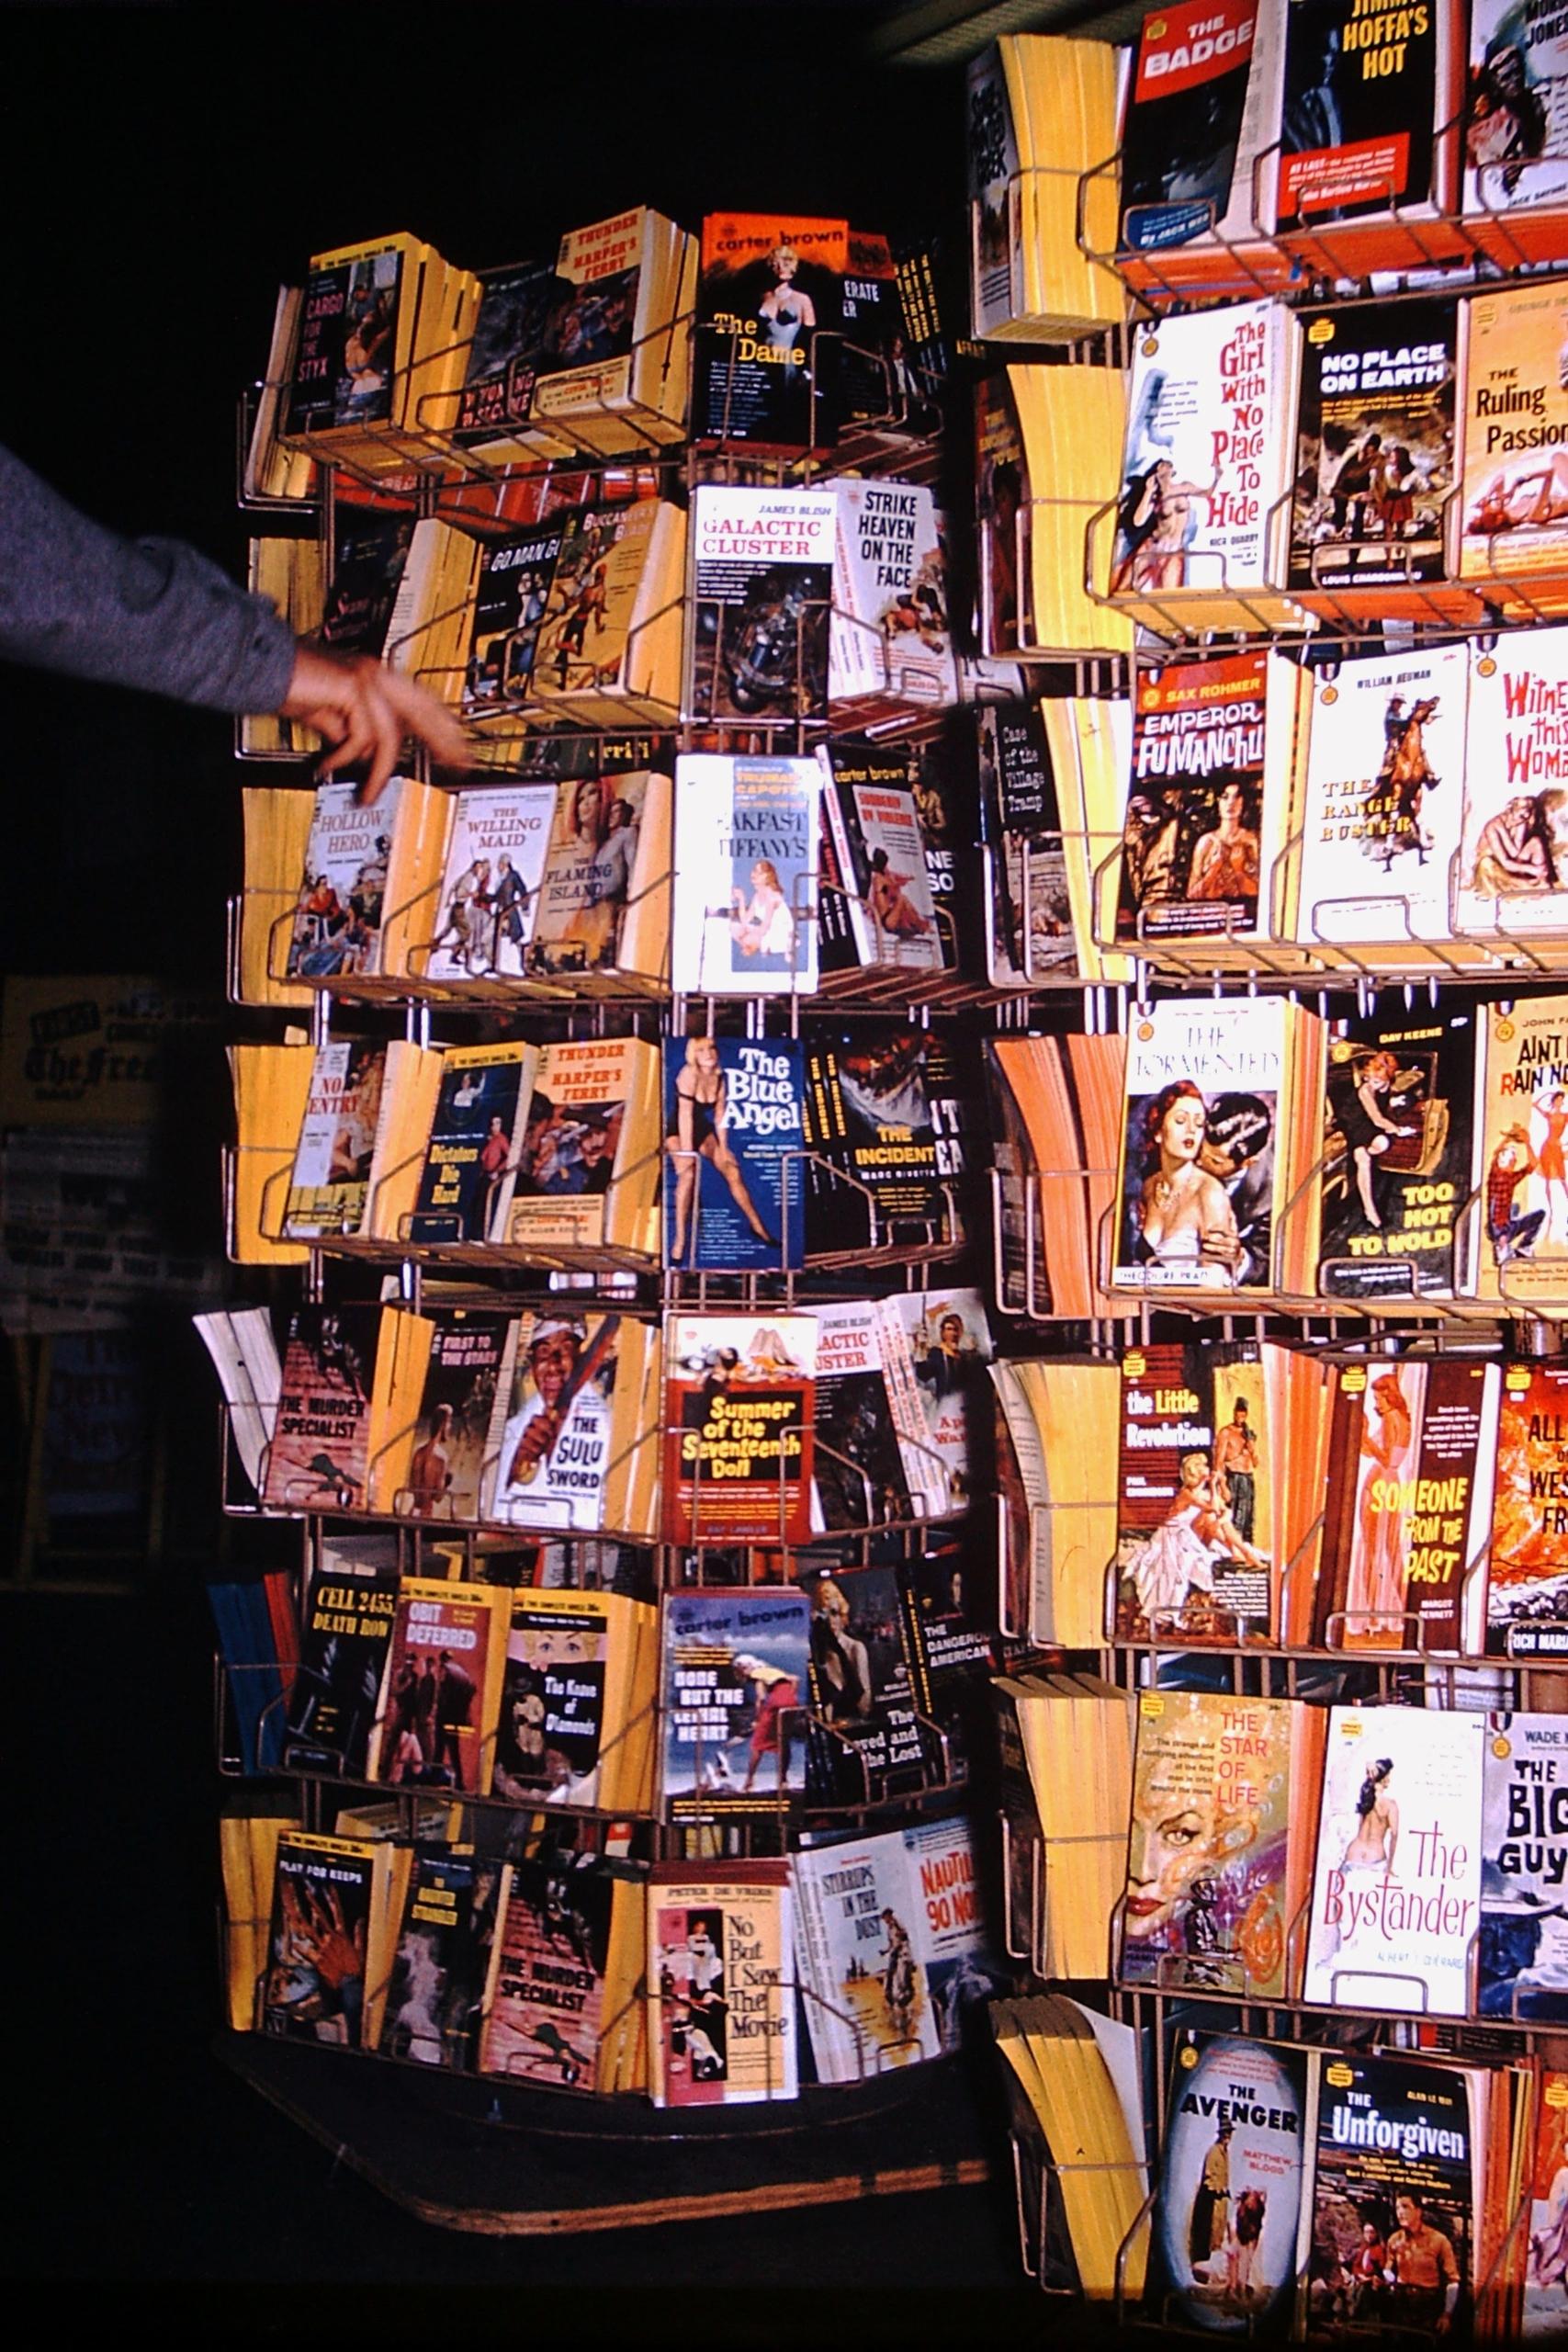 Photo - Paperback Pulp Fiction  - marksusina   ello